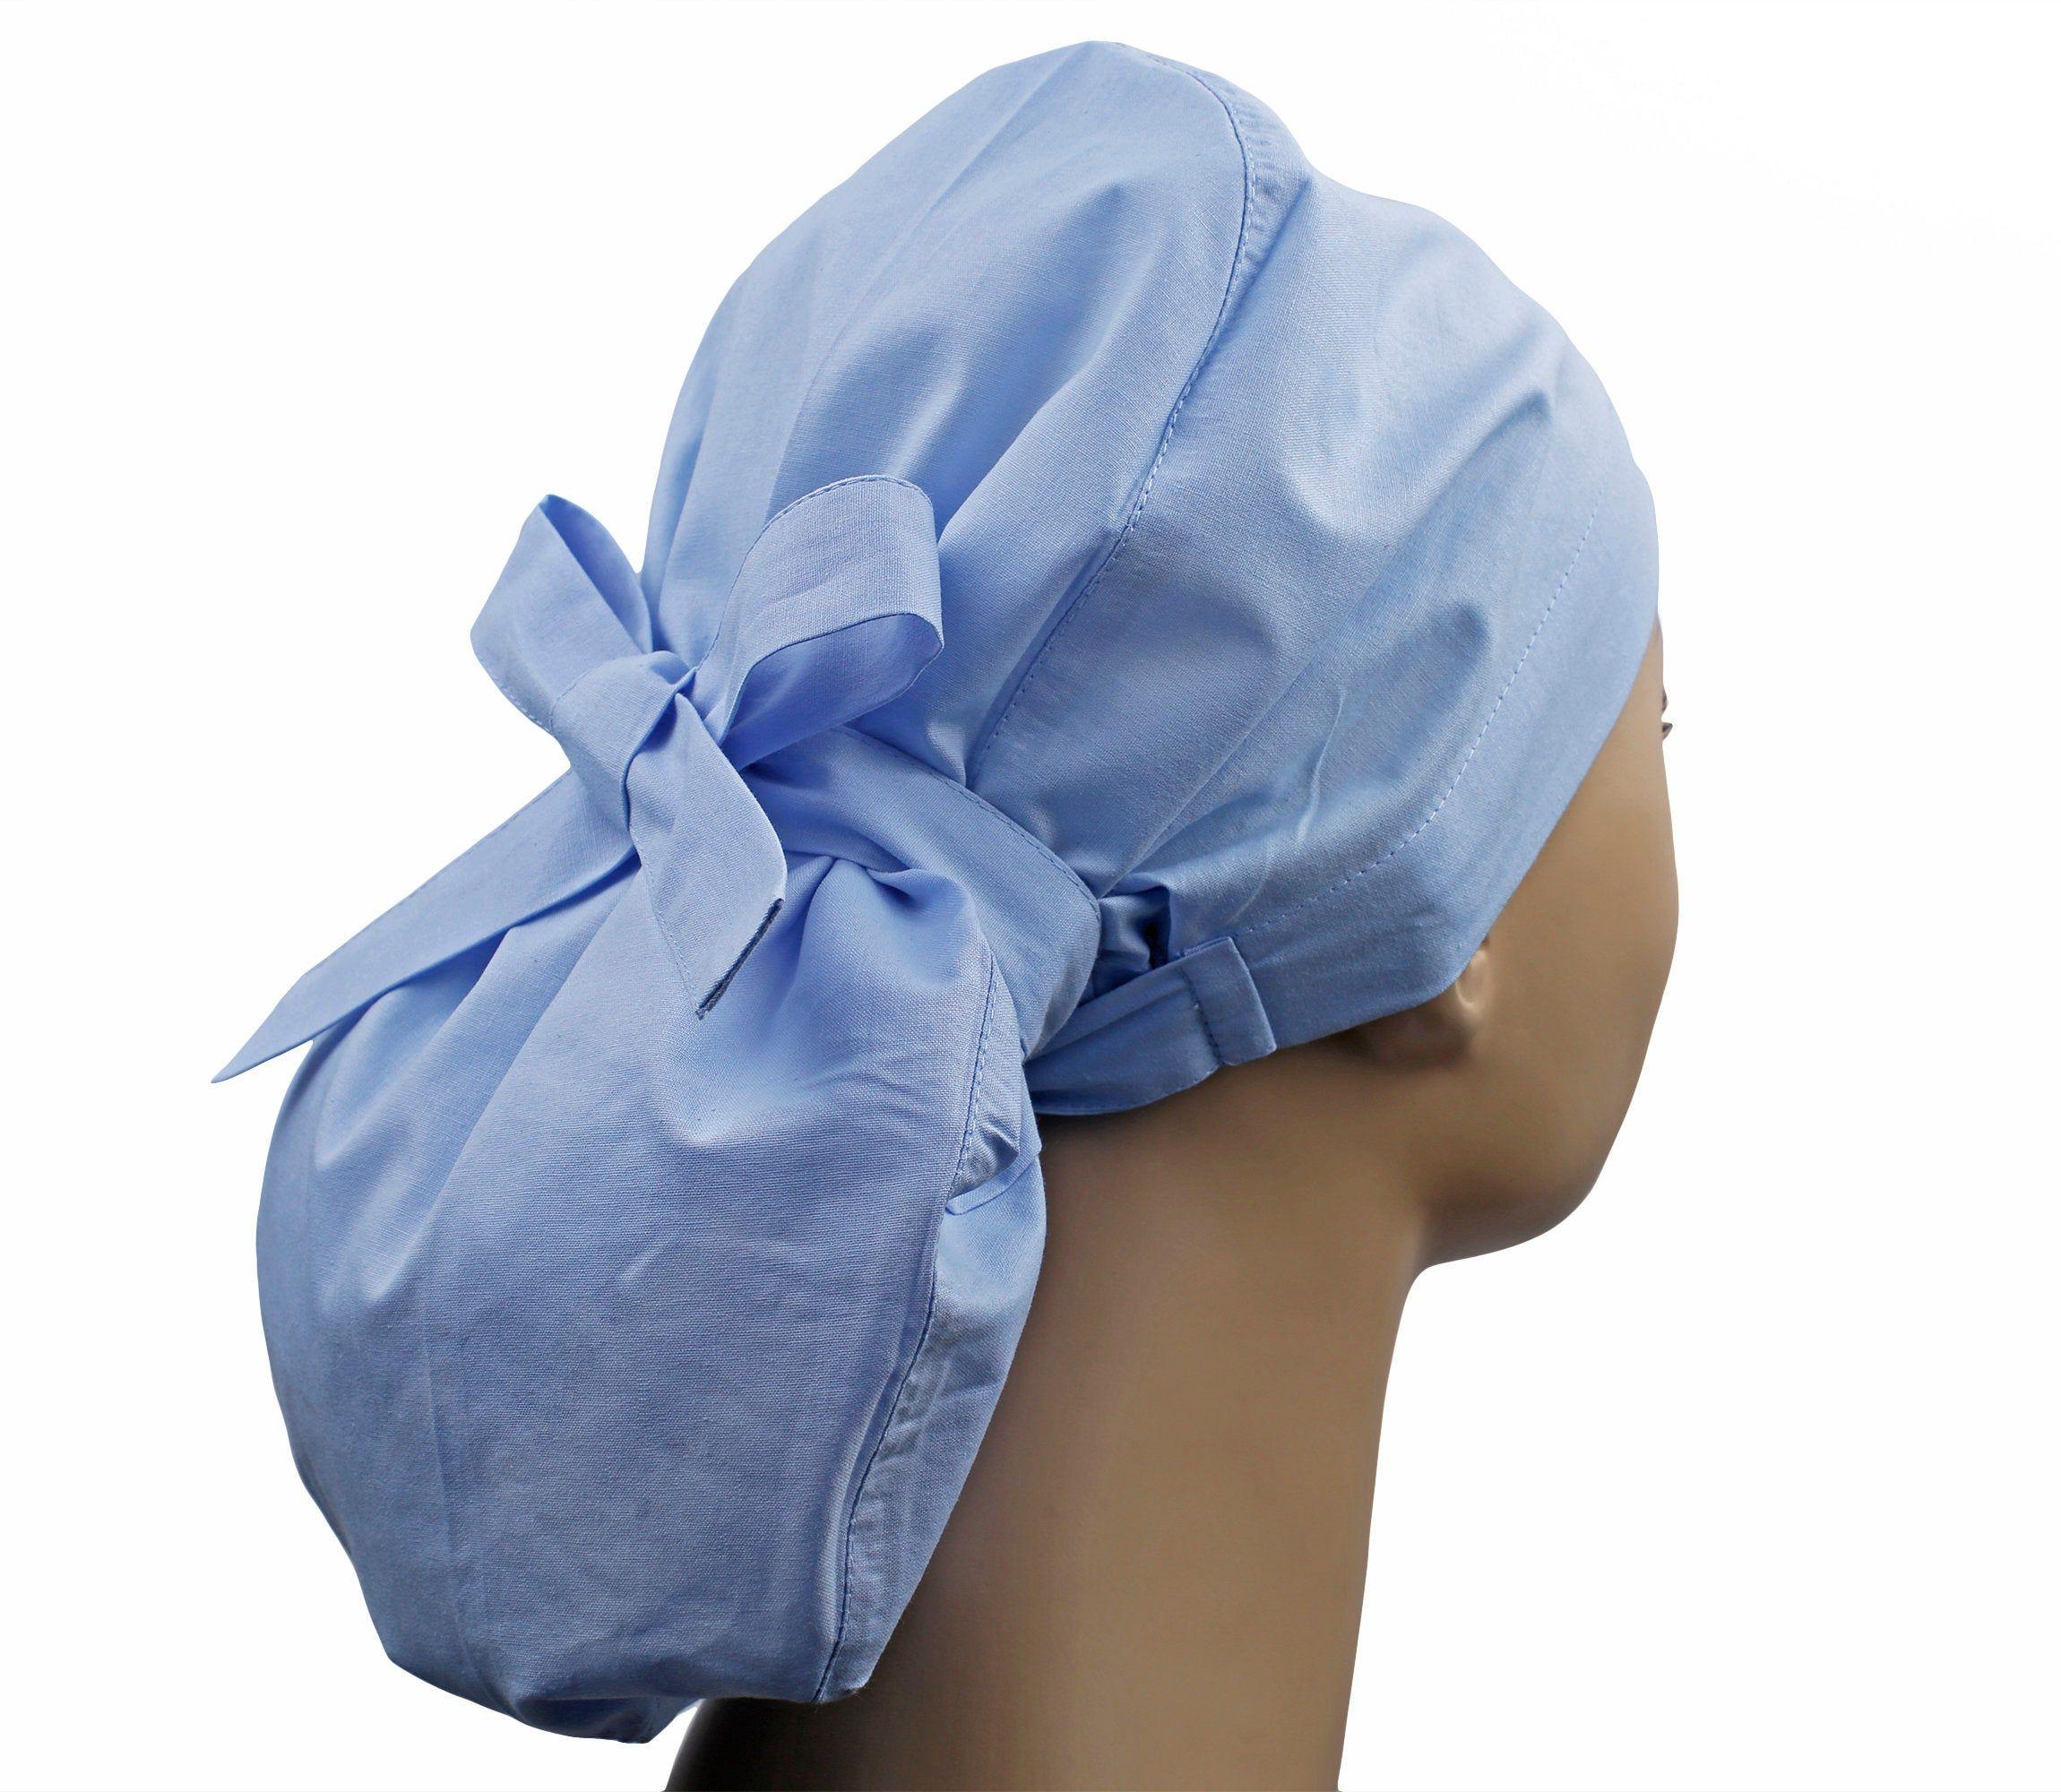 Stylish Scrub Caps Floral Ponytail Scrub Cap Surgical Caps Surgical Hats Scrub Caps for Women